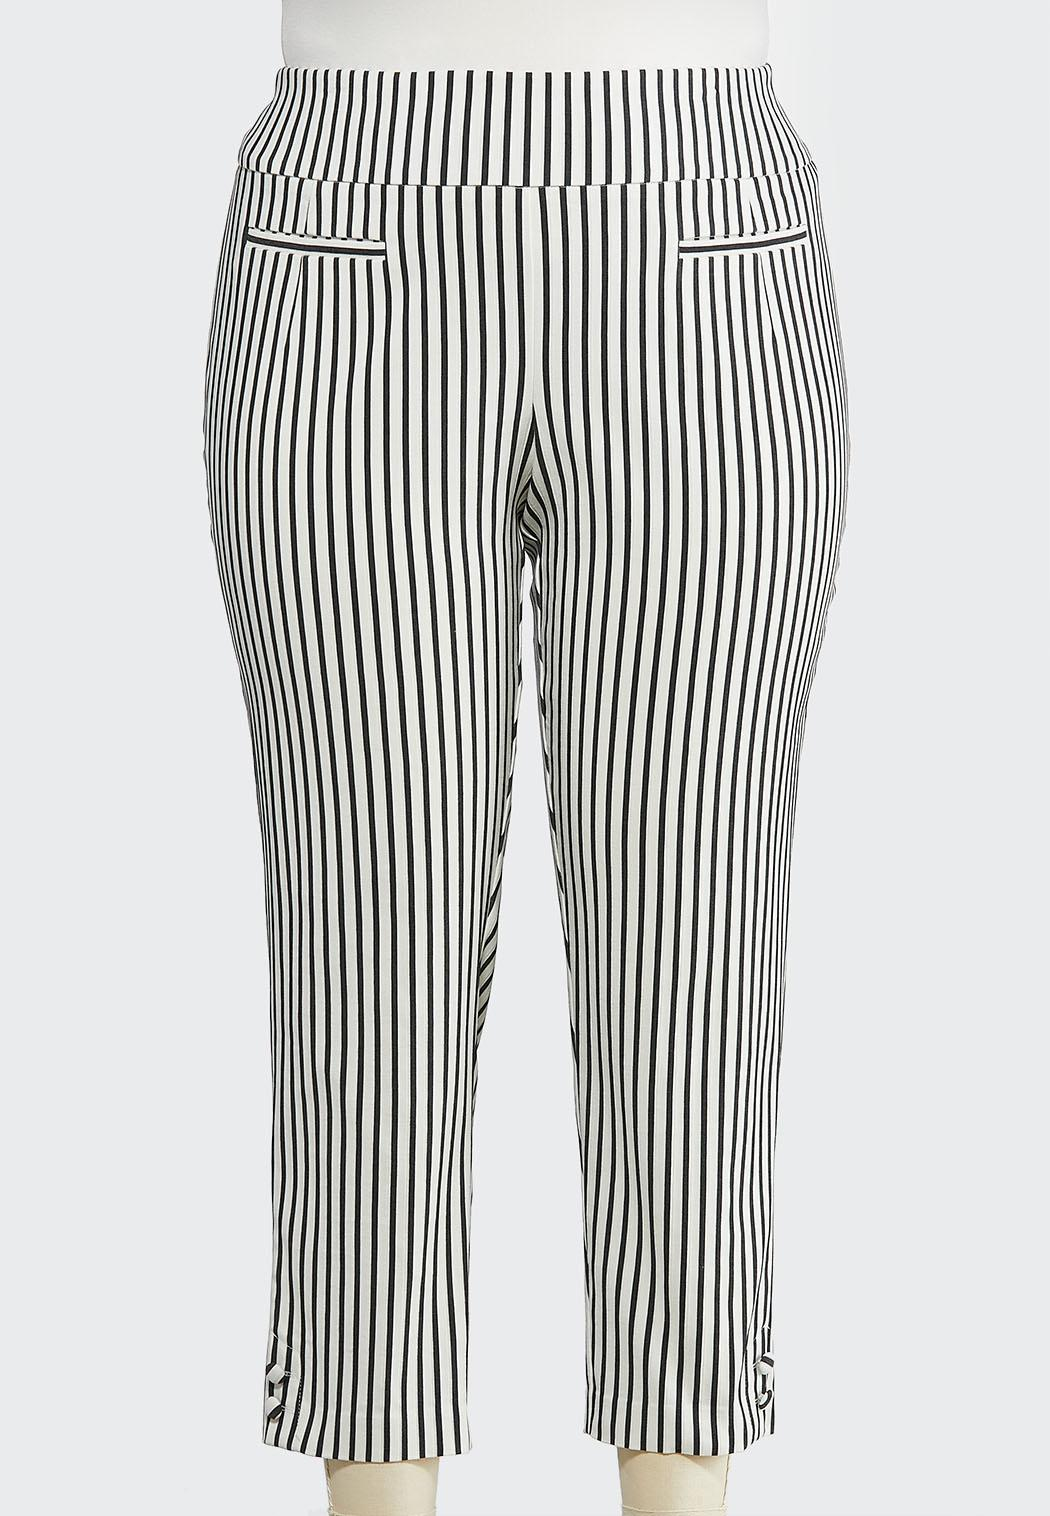 dac1db7484c Plus Size Stripe Bengaline Pants Ankle Pants Cato Fashions